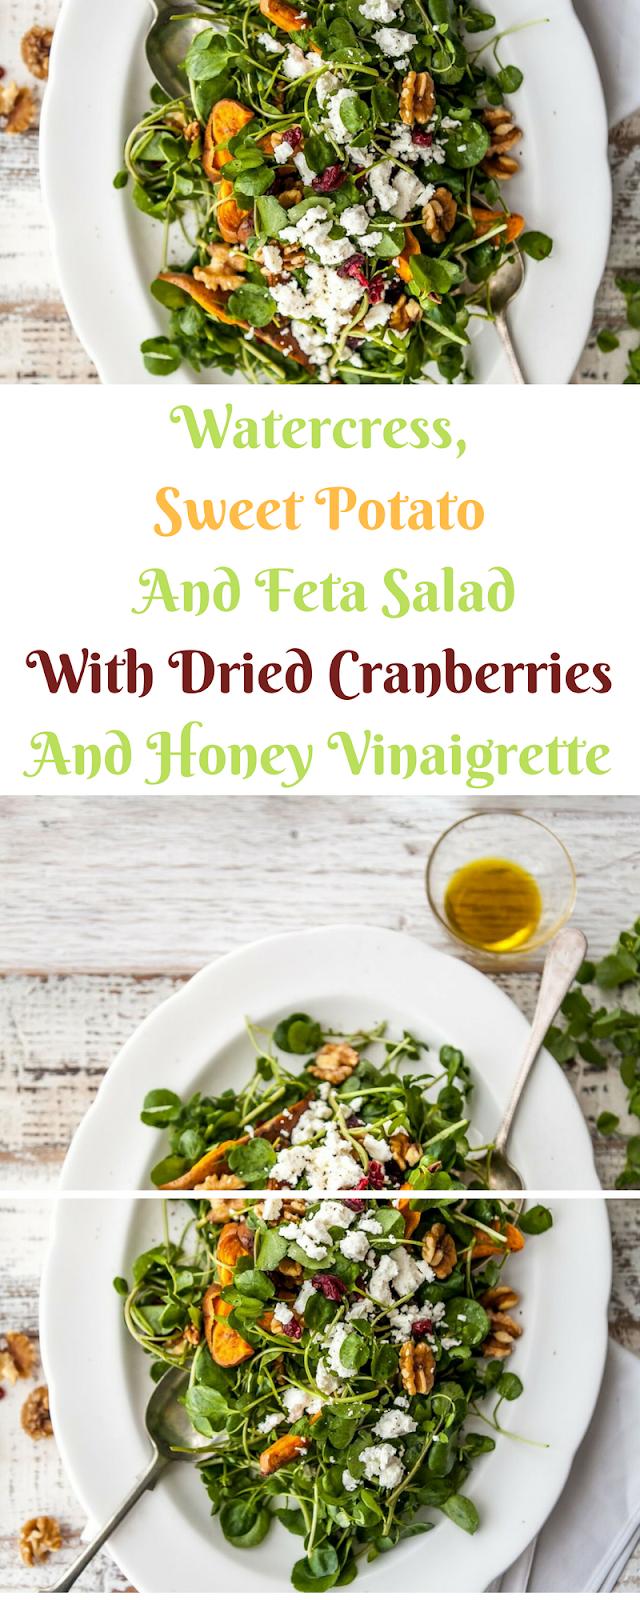 Watercress, Sweet Potato And Feta Salad